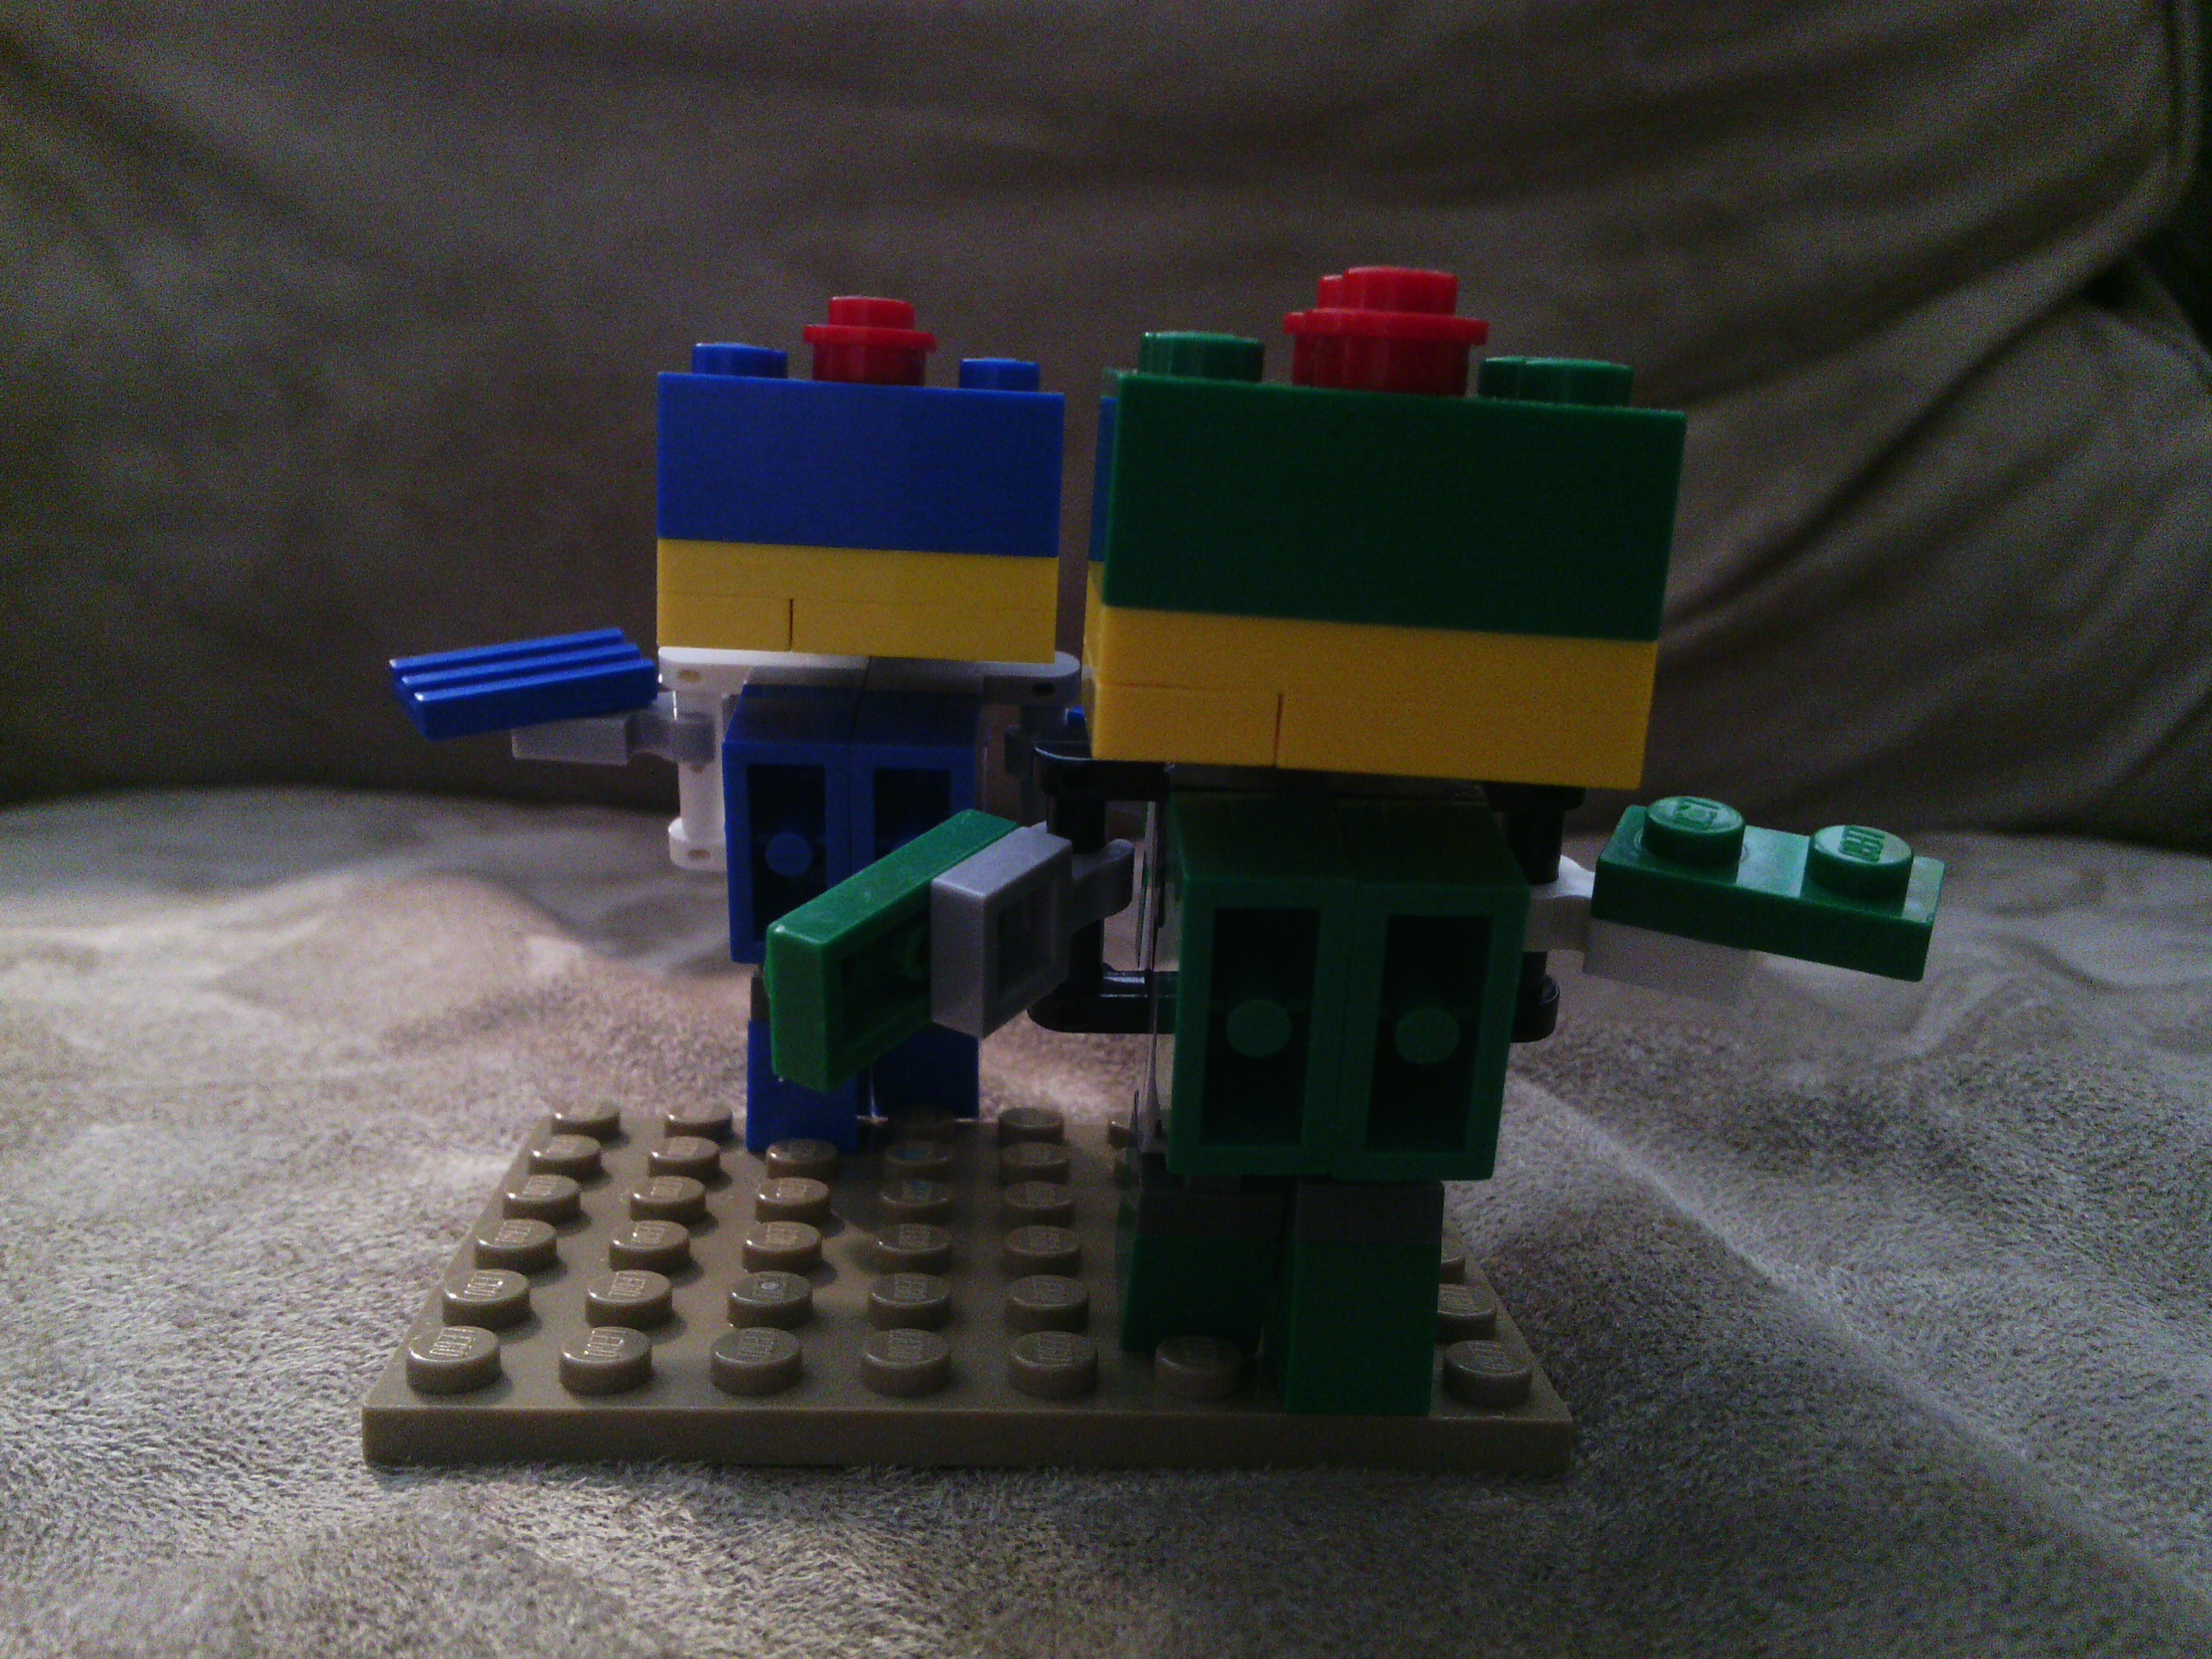 How To Build ThunderBumm & SpittleFumm out of Legos